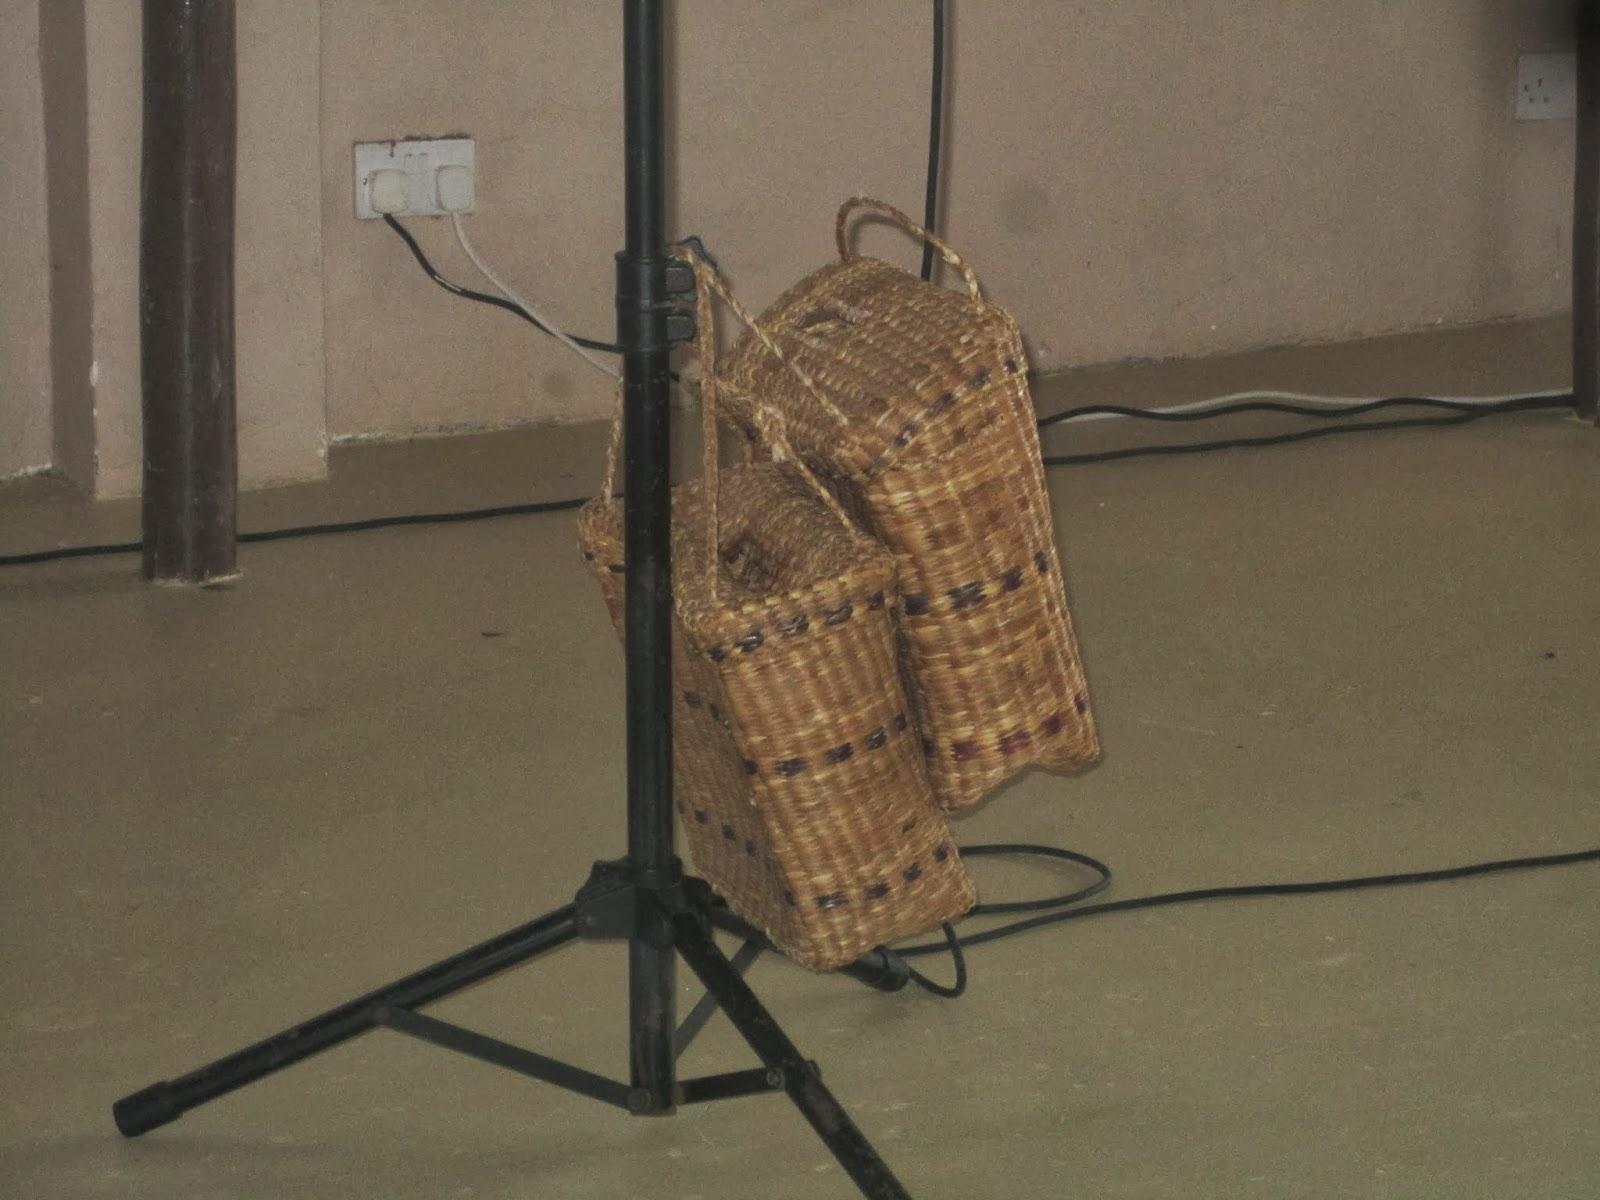 church offering baskets